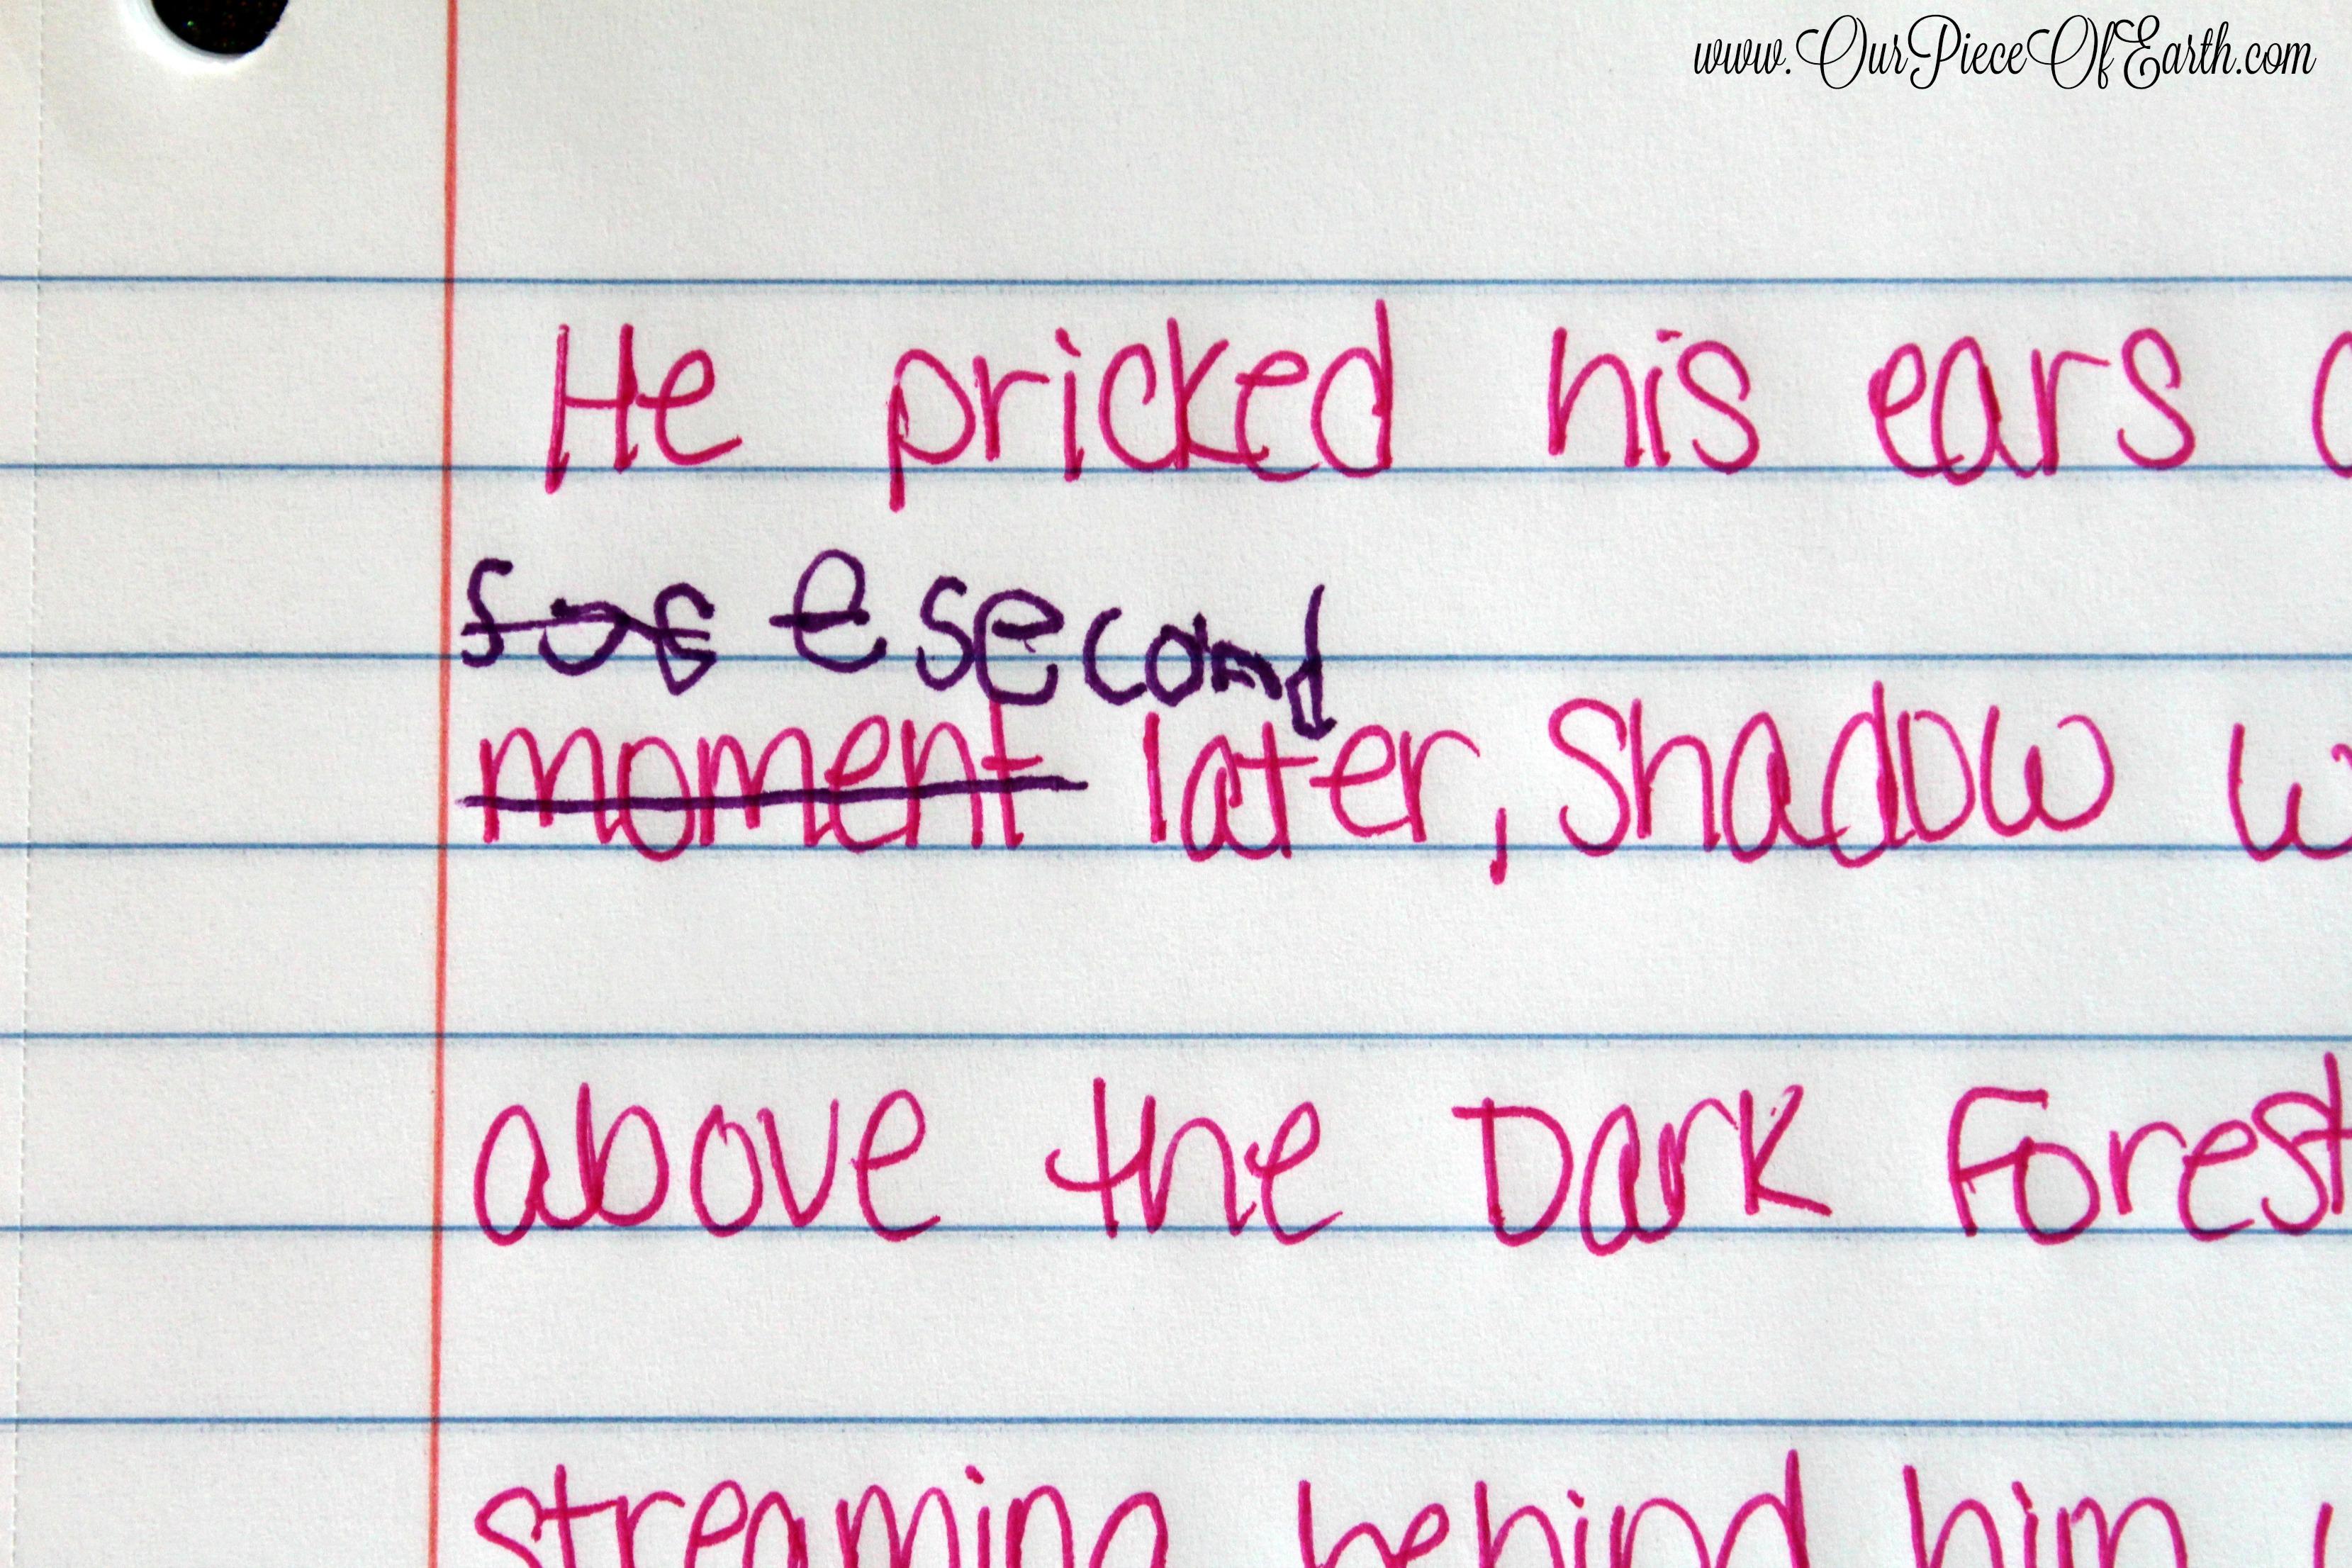 Maggie - writing